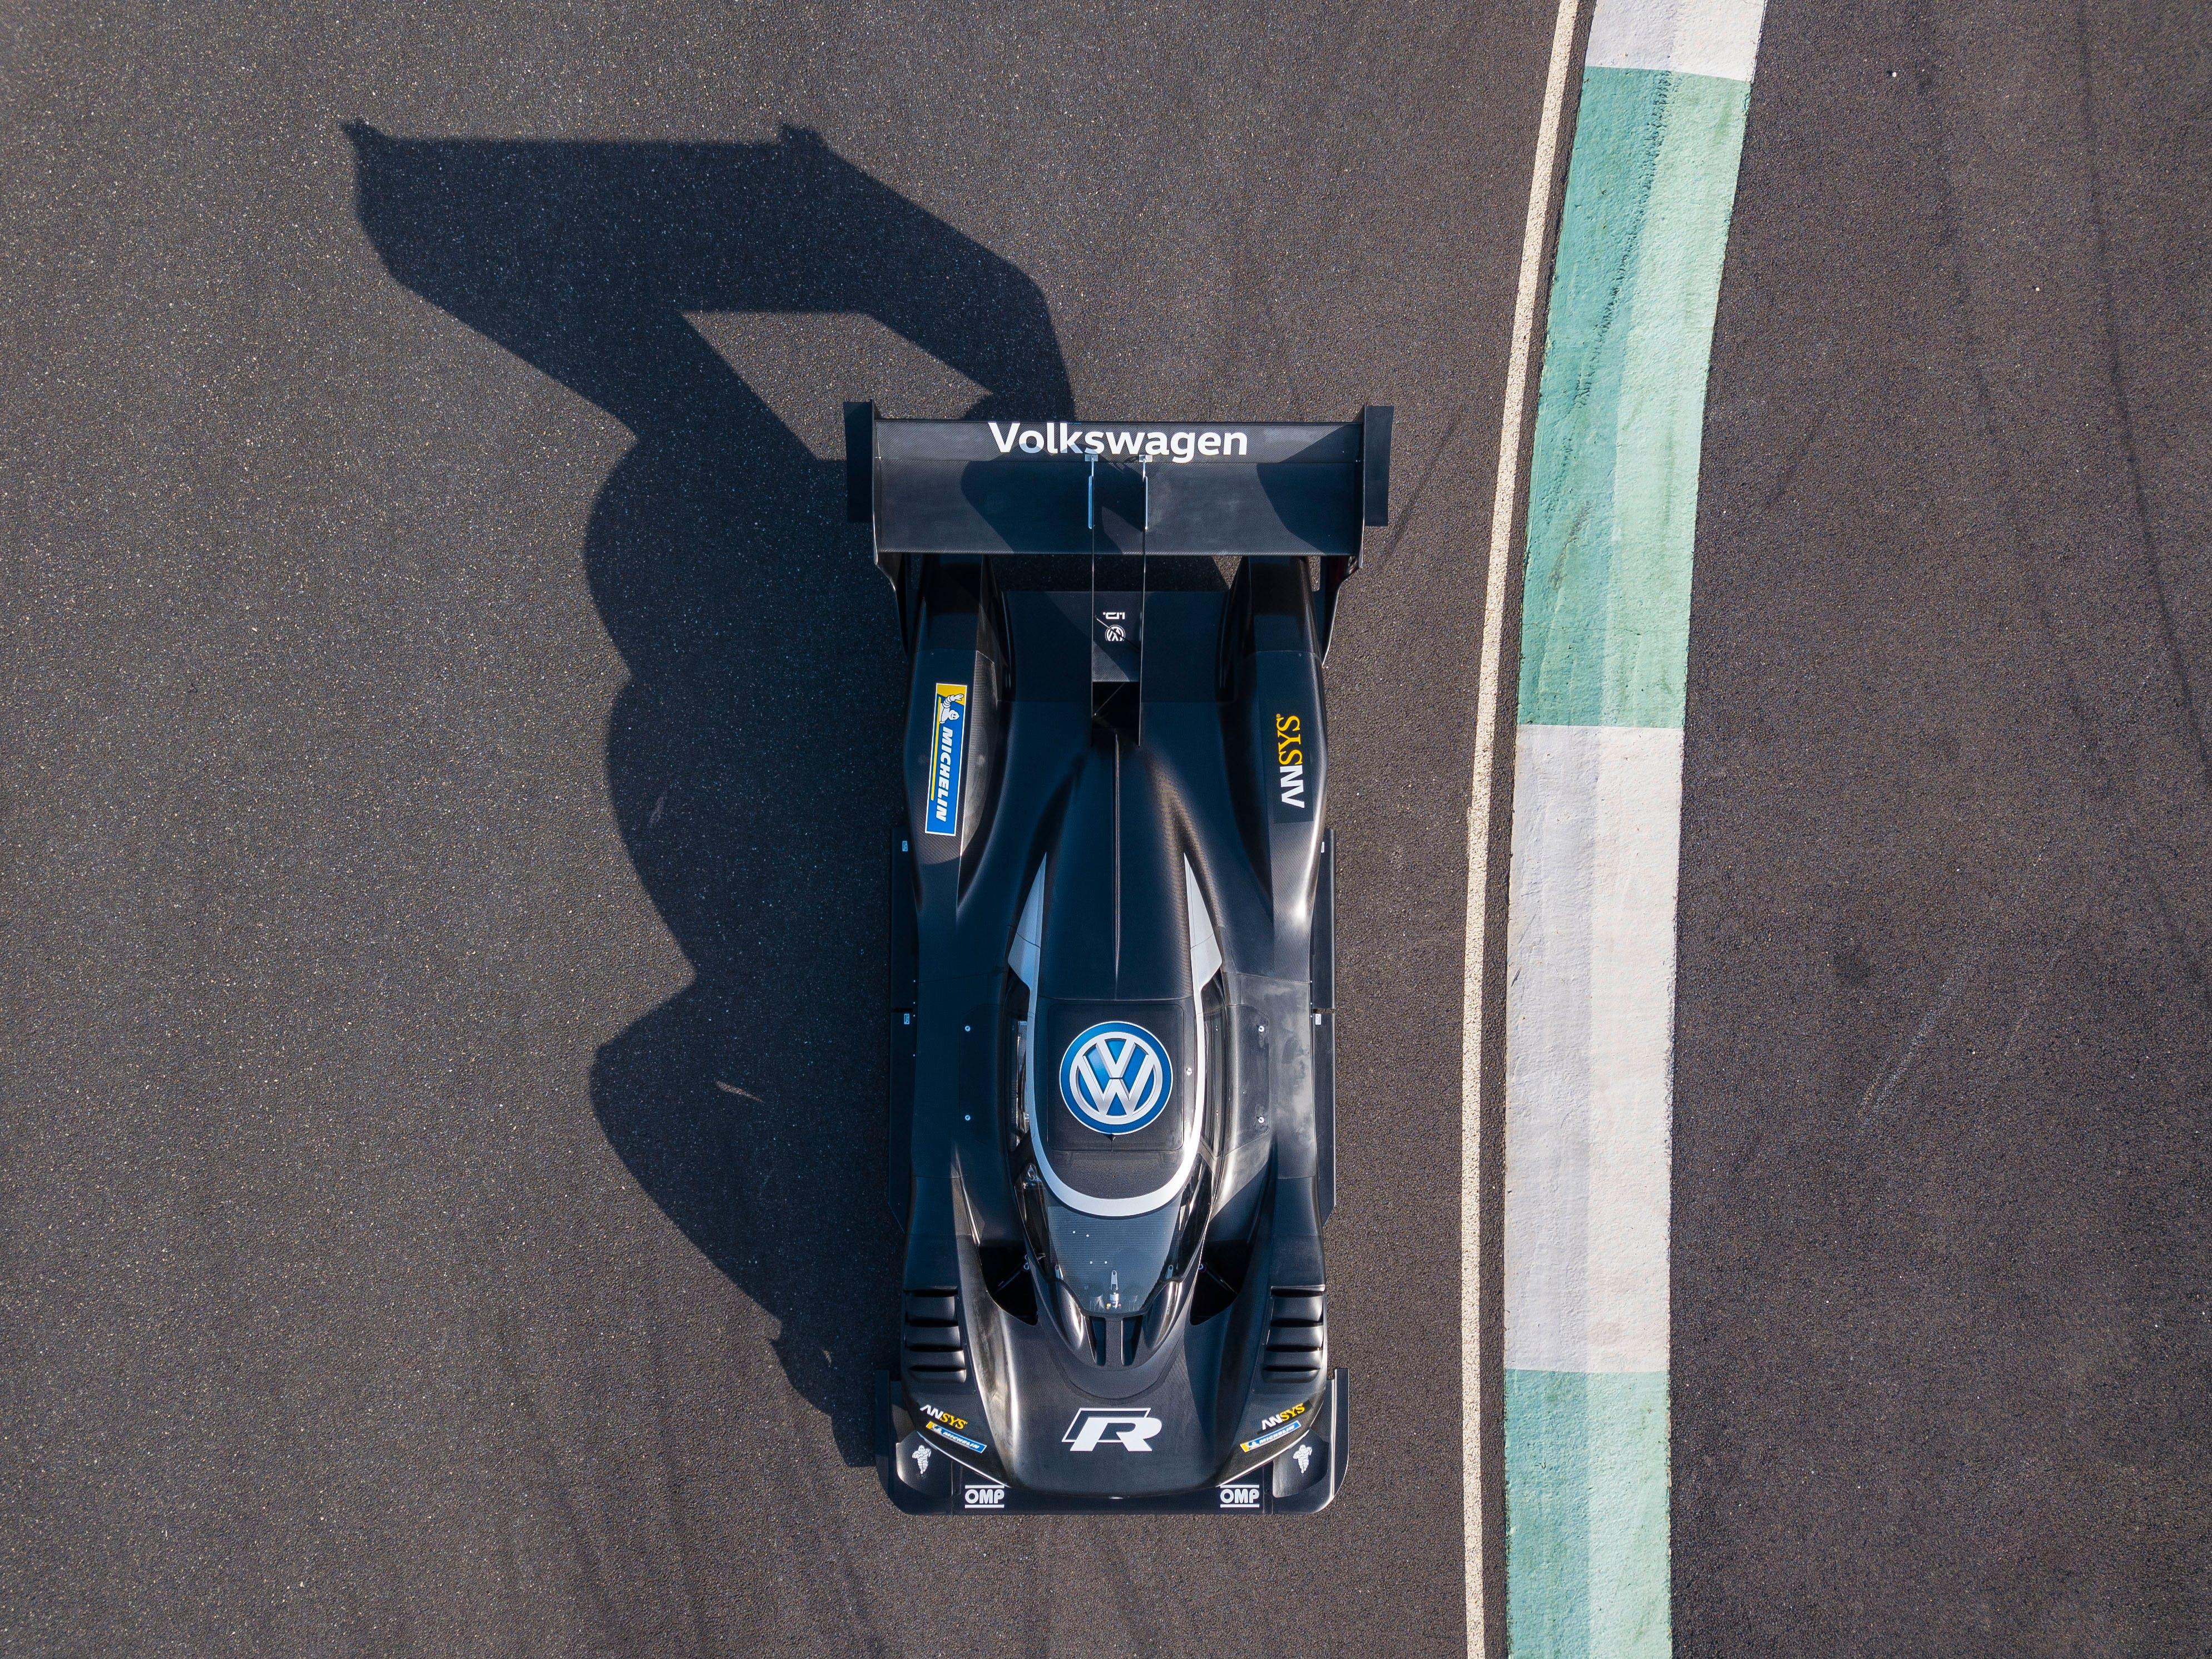 Black Volkswagen Race Car On Track